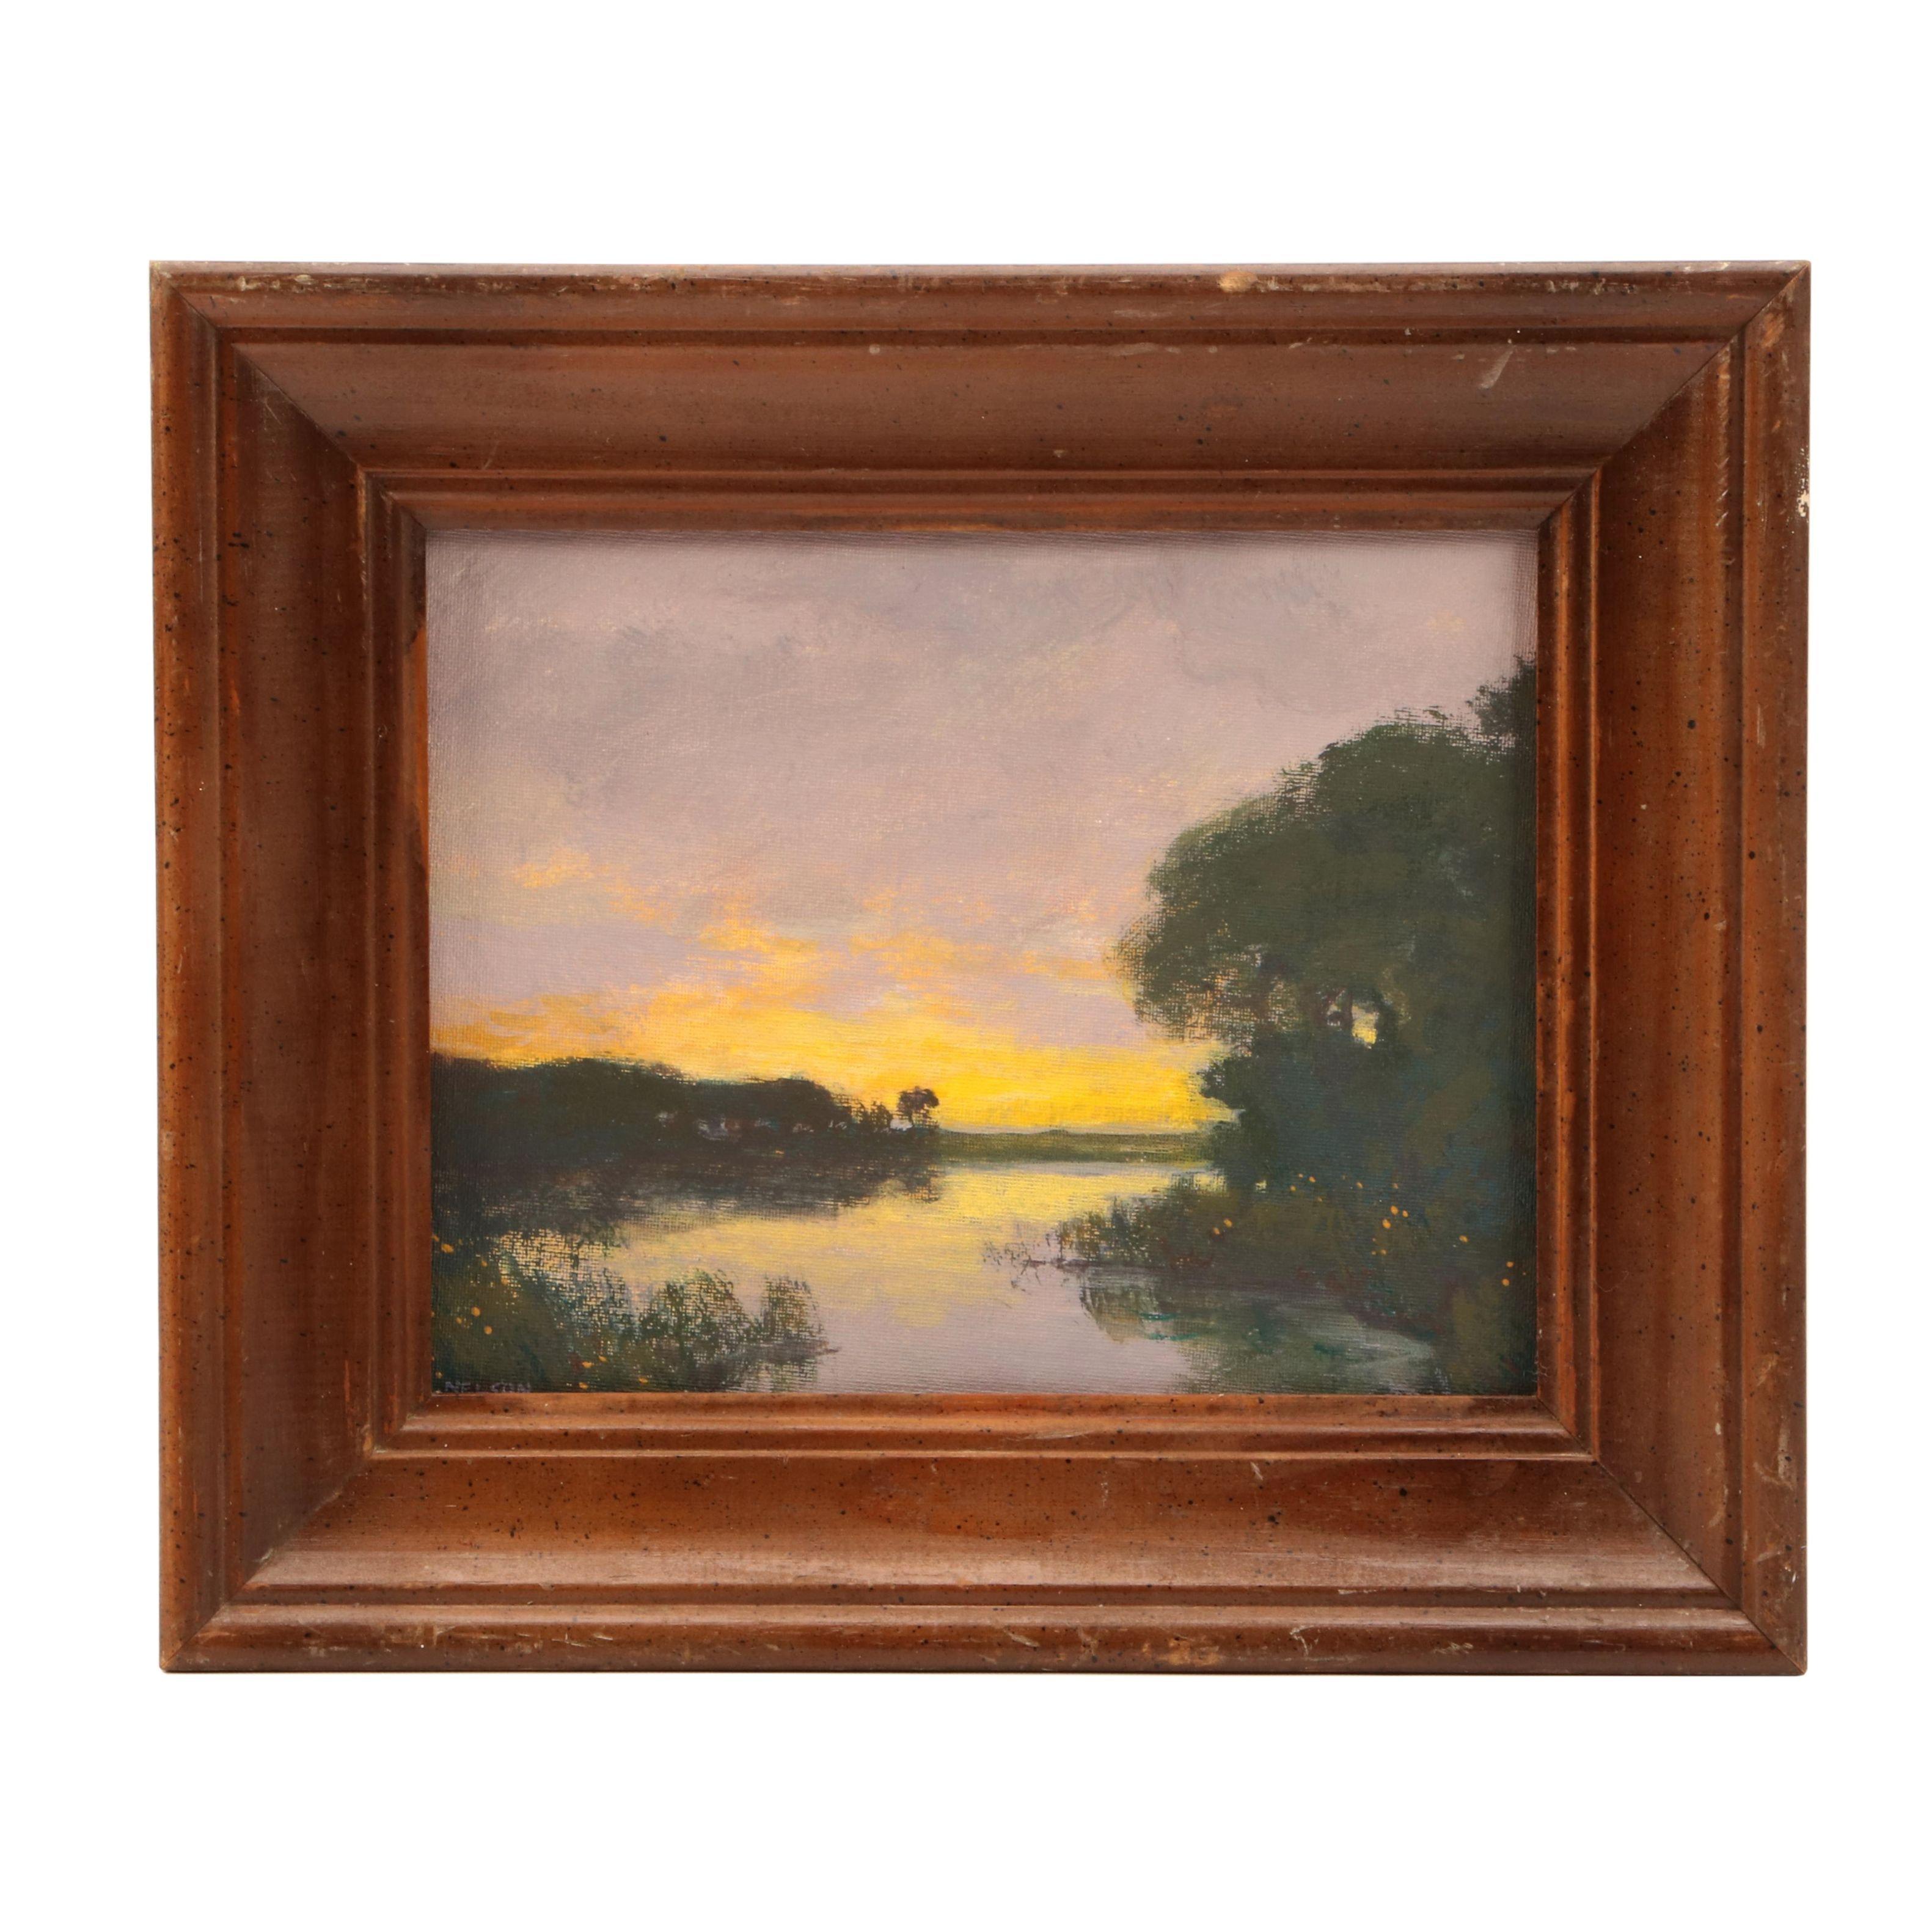 William Nelson Landscape Oil Painting